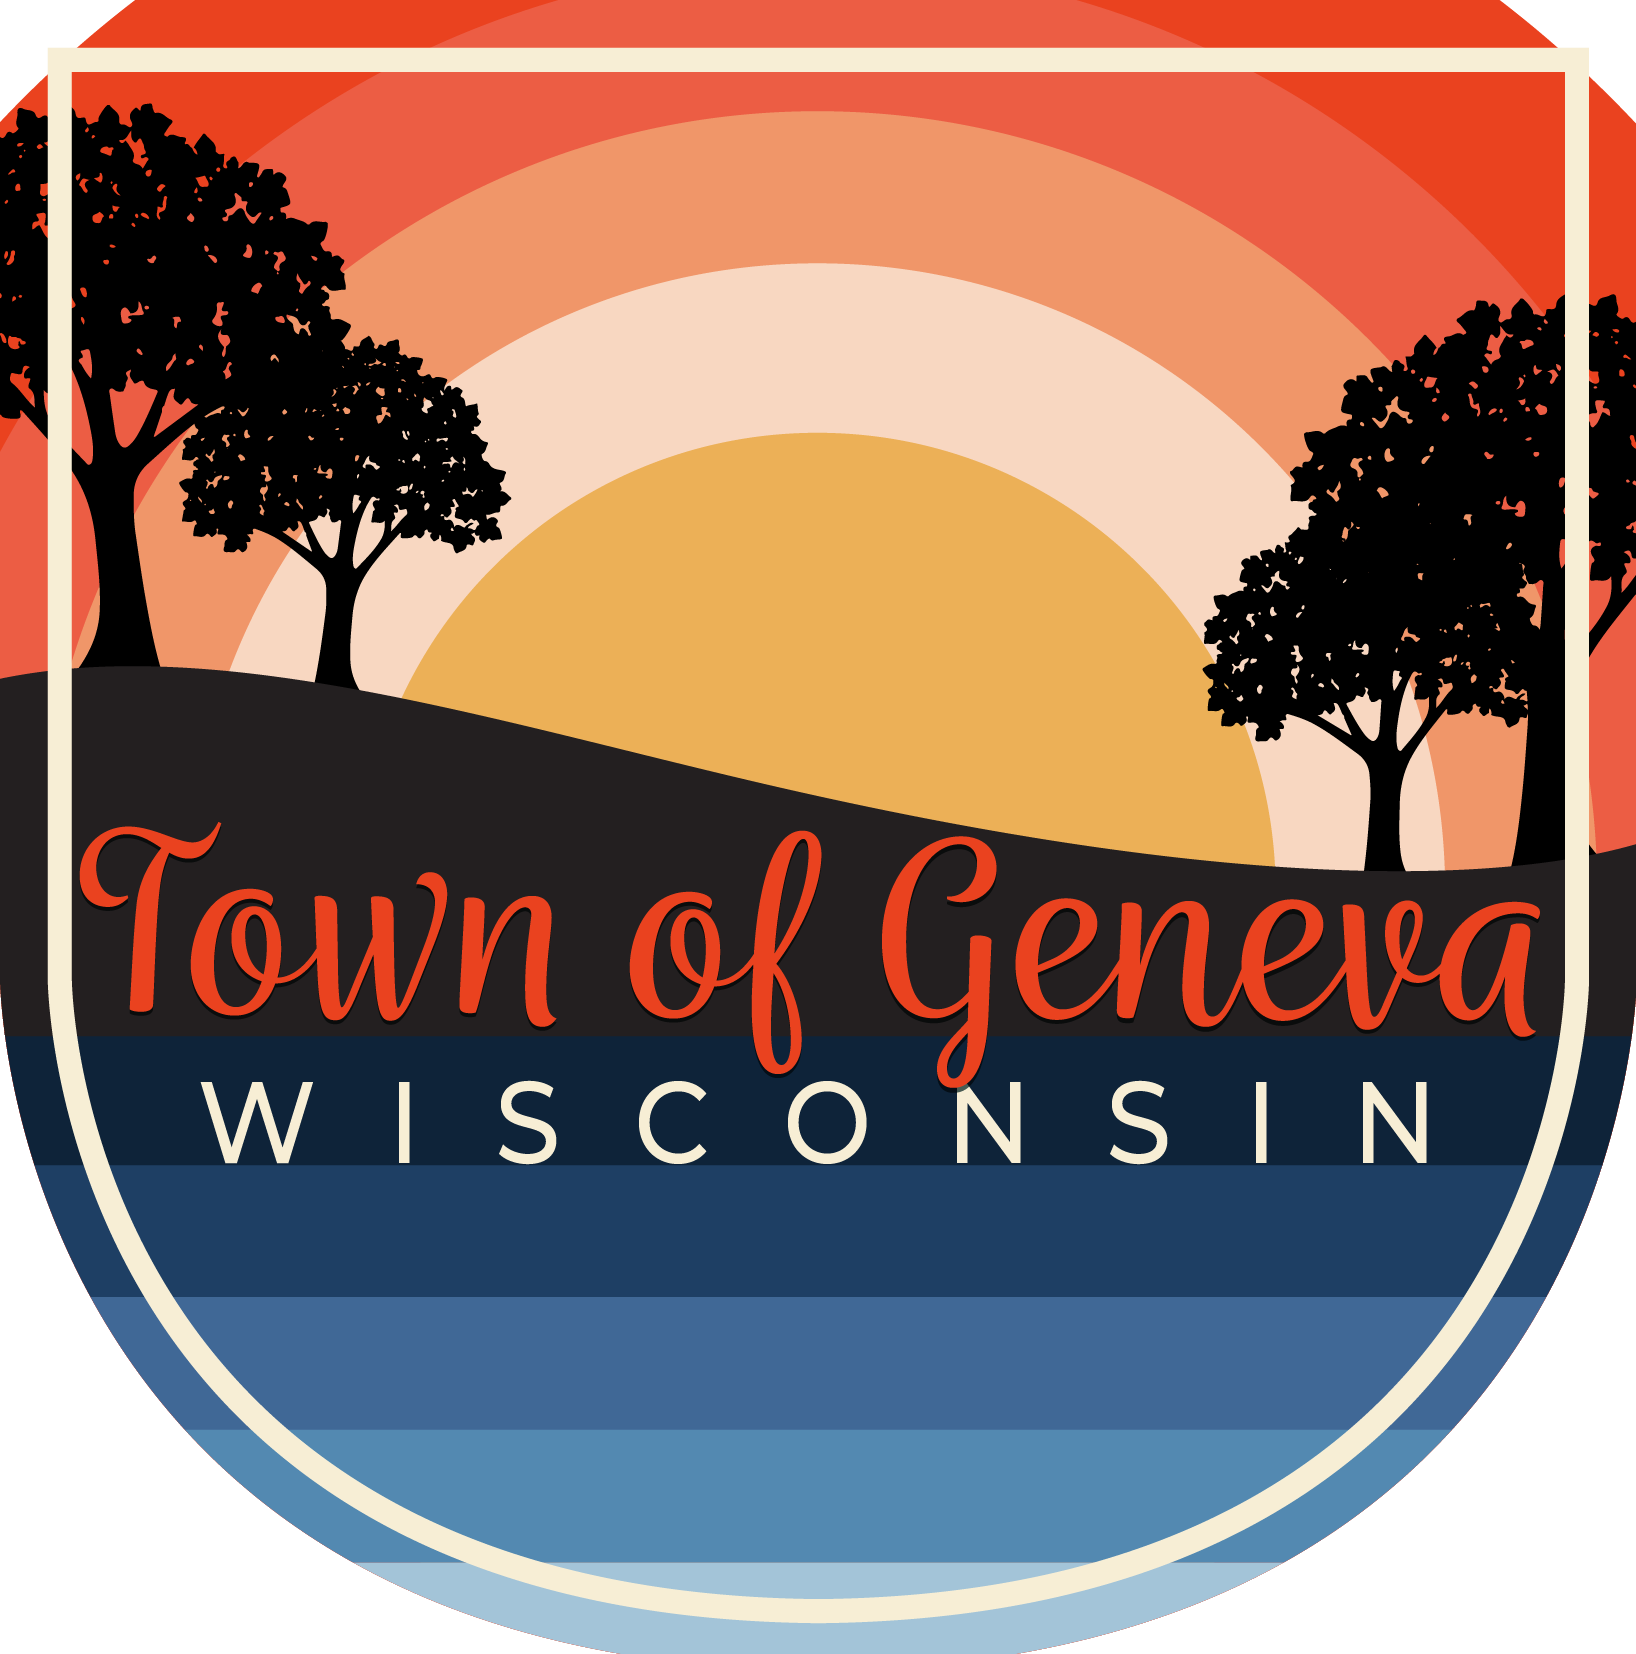 Town of Geneva, Walworth County, Wisconsin